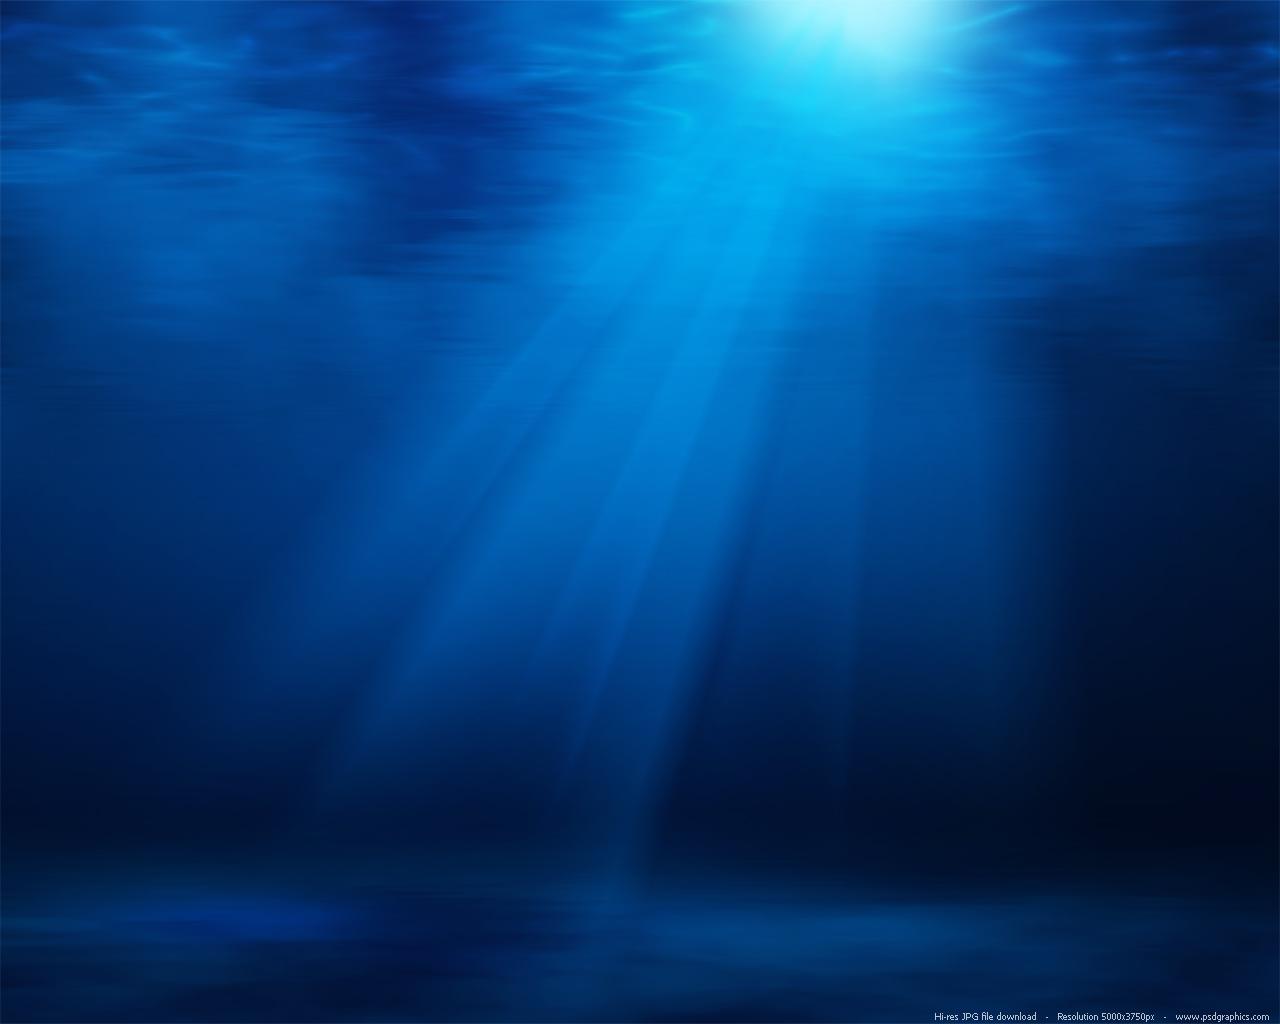 underwater with sun rays background psdgraphics underwater background 1280x1024